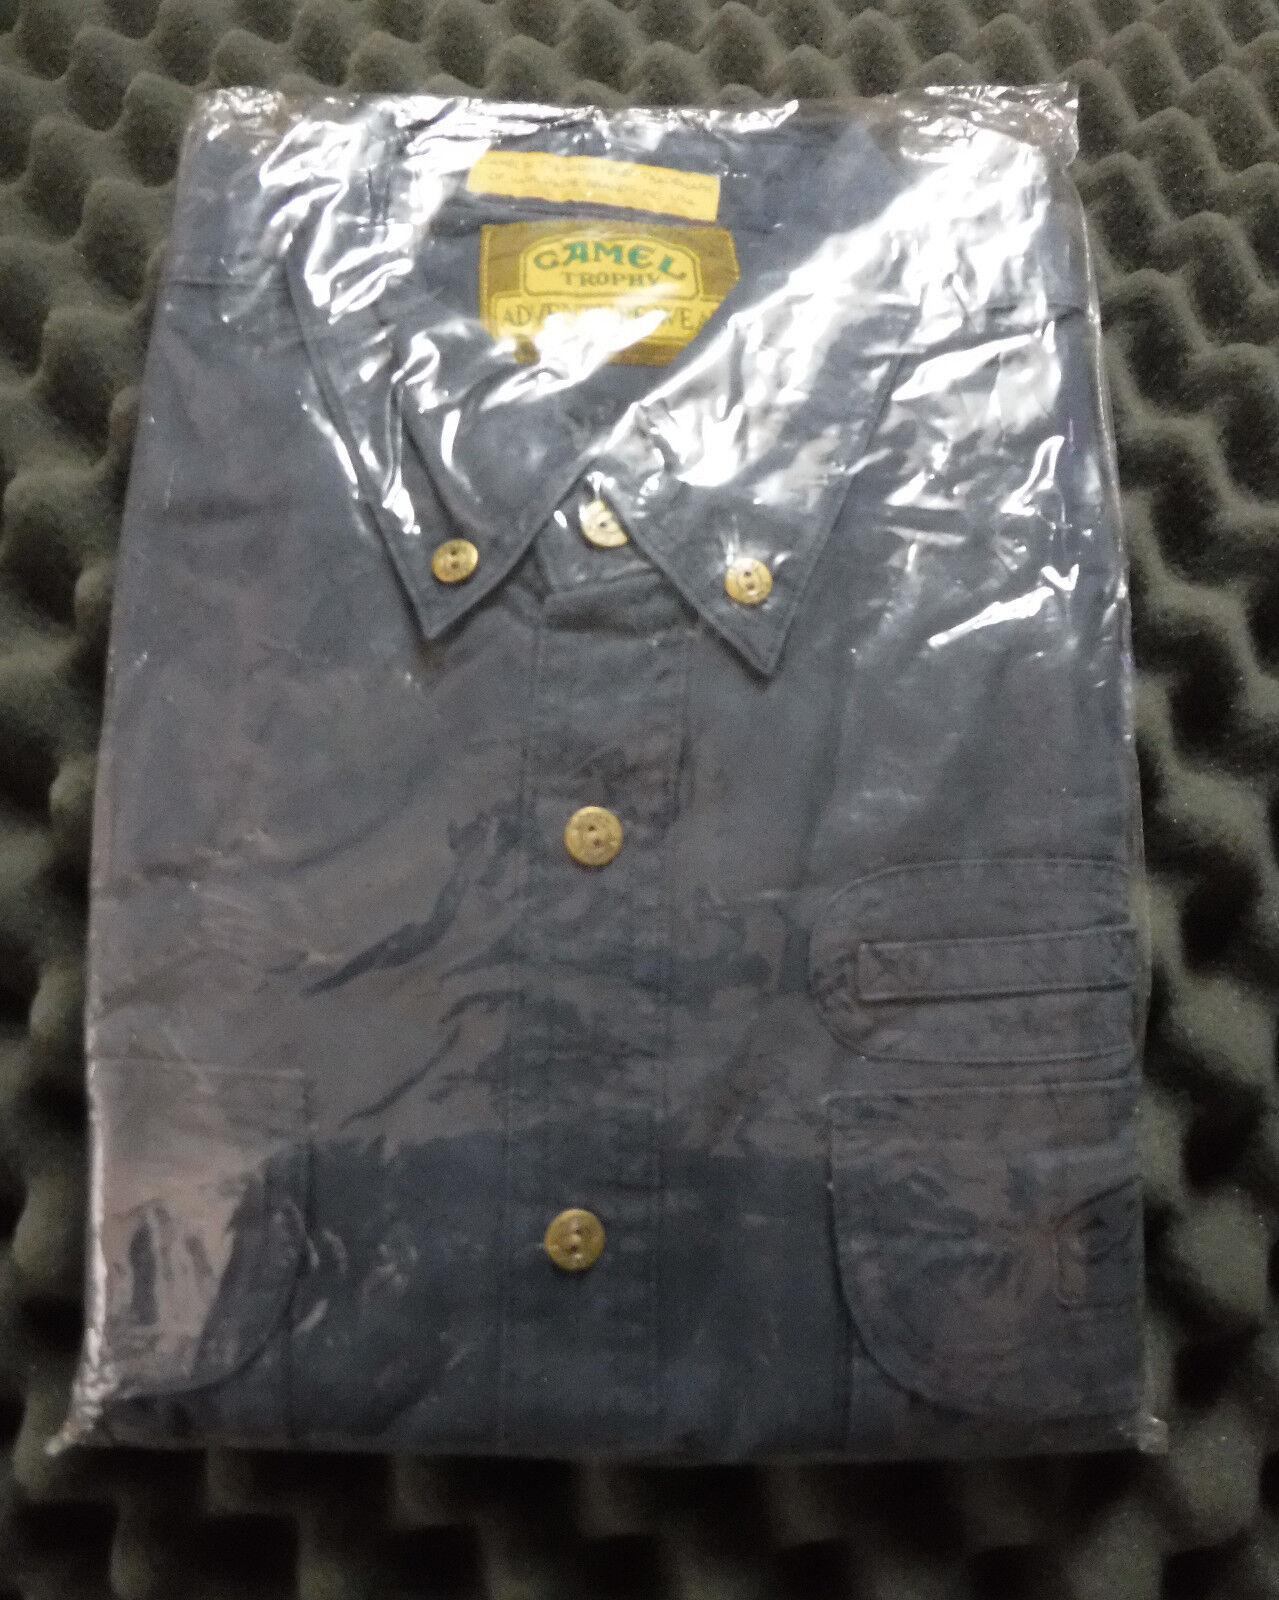 Camel Trophy Adventure Wear Safari Shirt Cargo Button Short Sleeve bluee Size XL